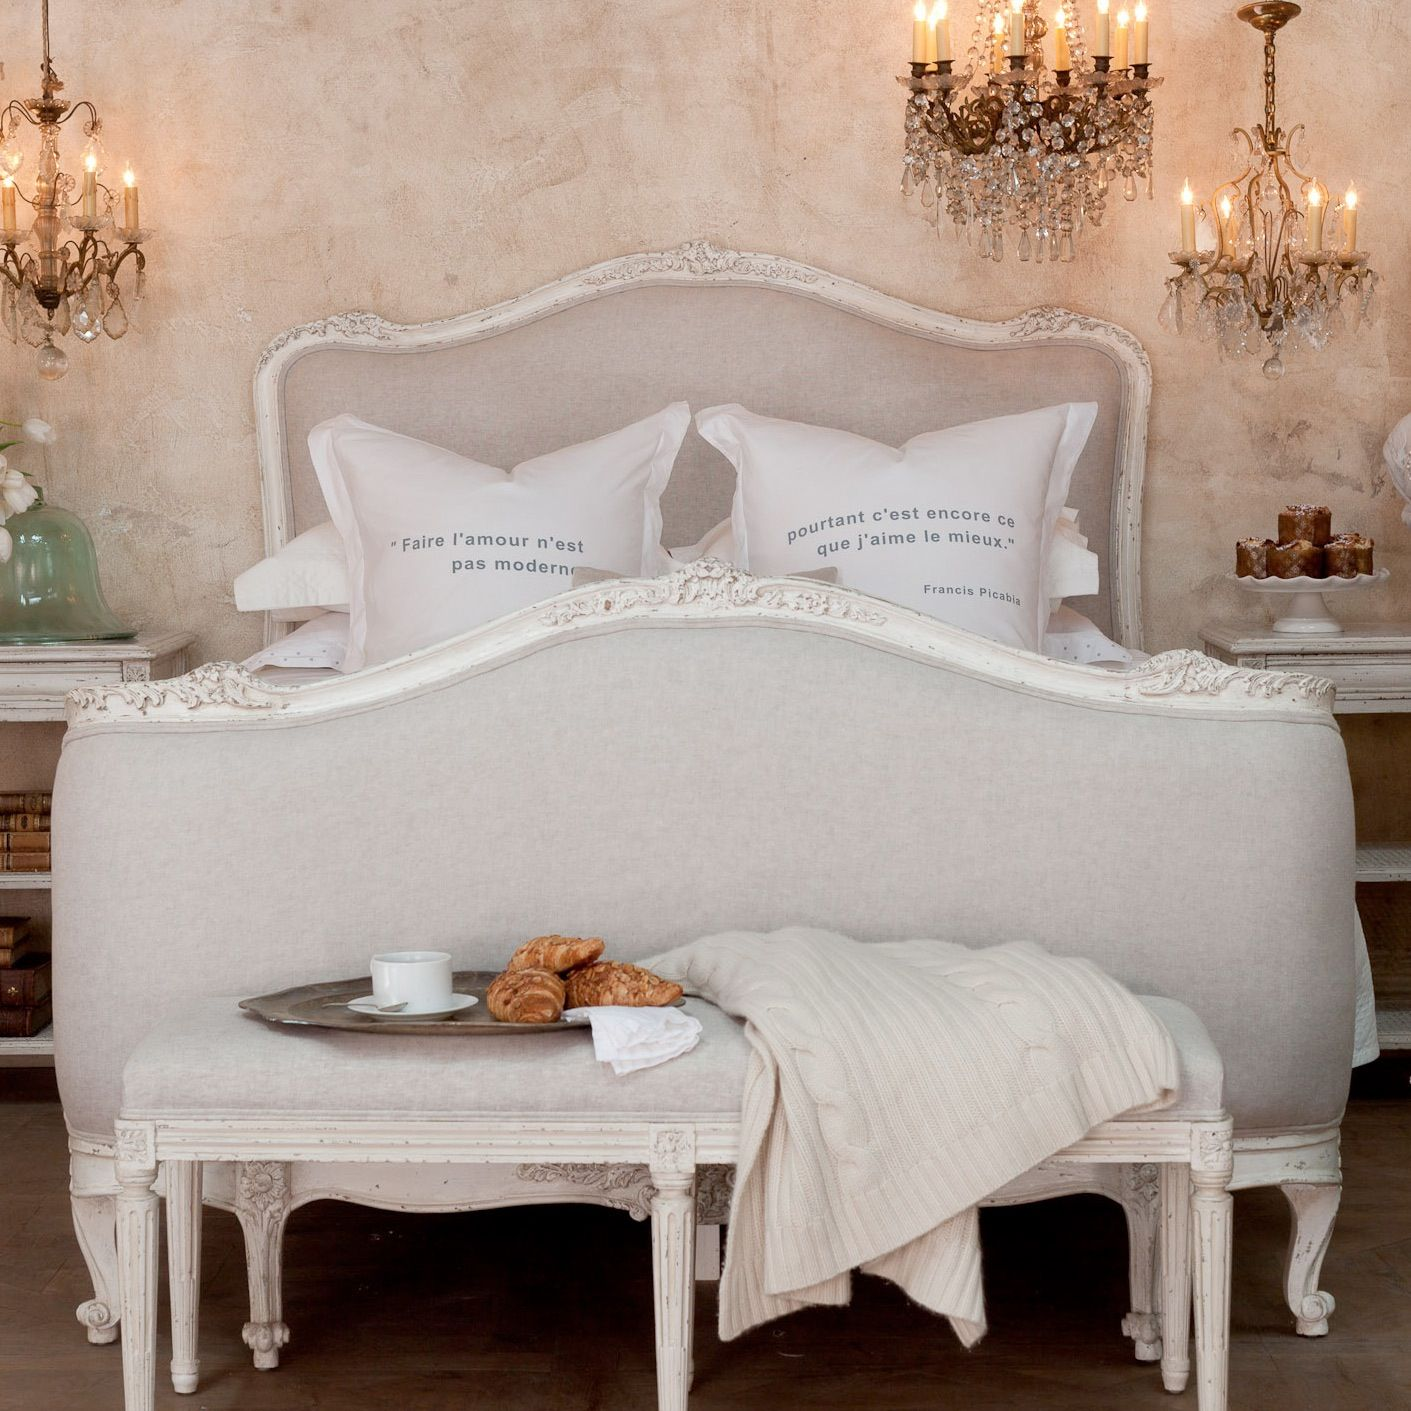 French Provincial bedroom | Bedrooms | Bedroom decor ...